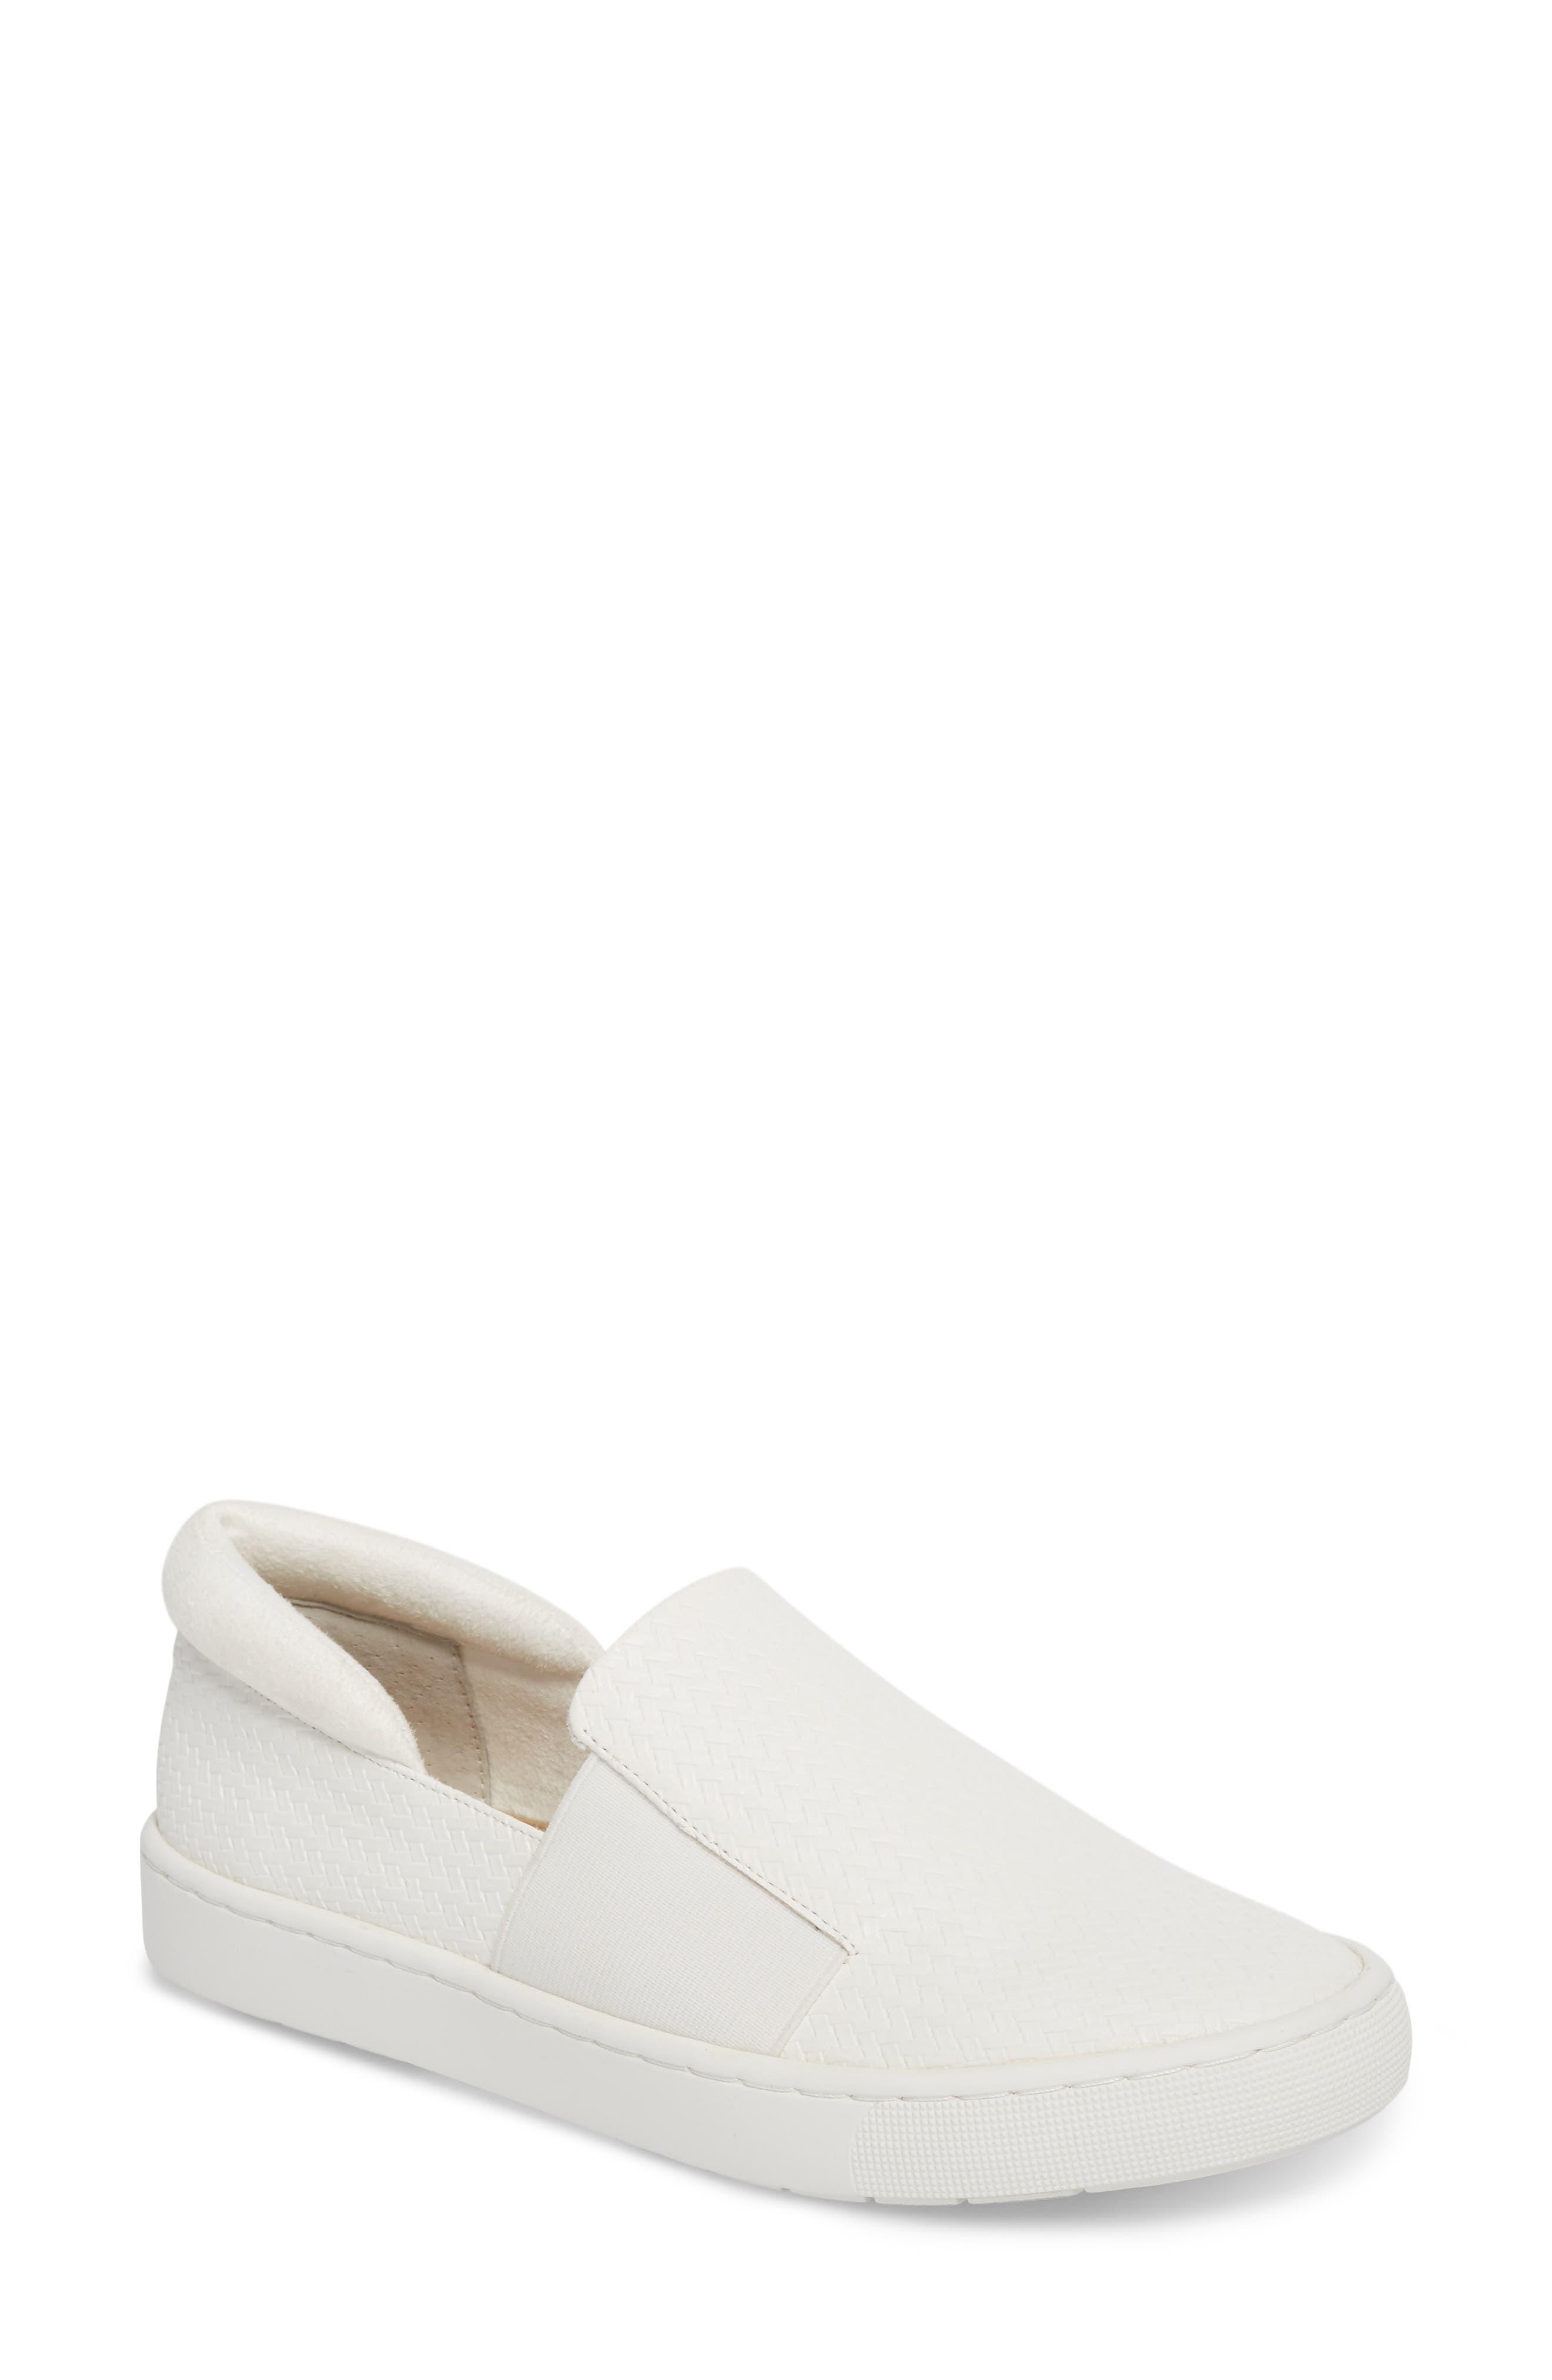 Main Image - Bella Vita Ramp II Slip-On Sneaker (Women)